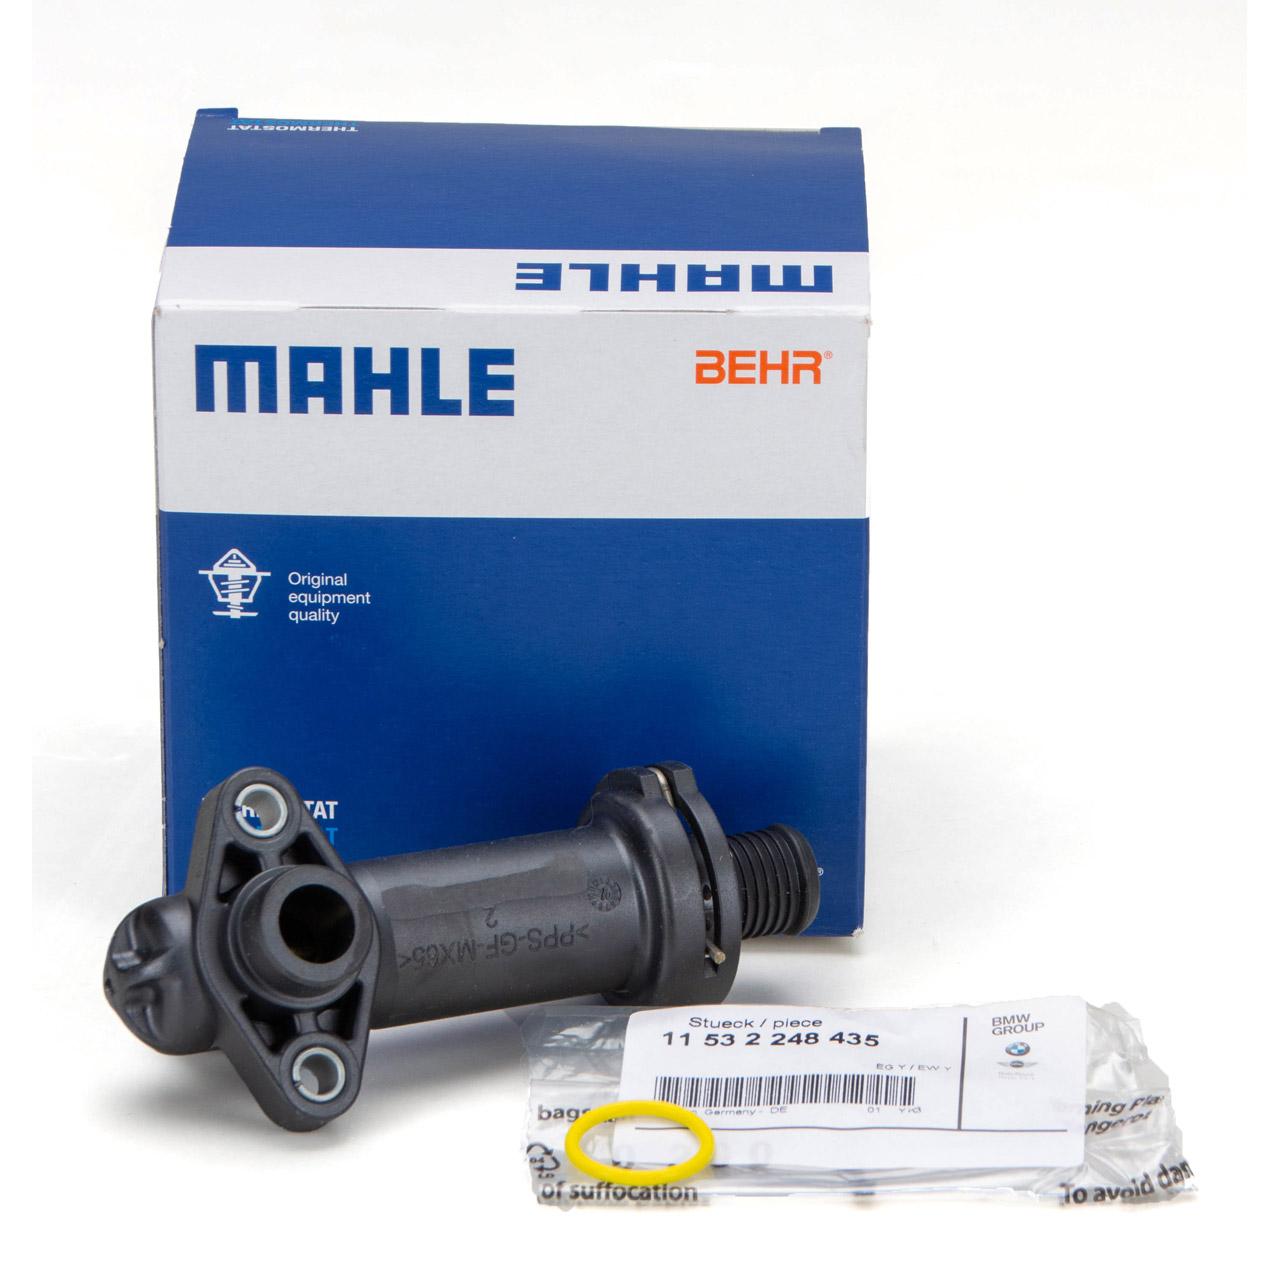 BEHR MAHLE TE170 AGR Thermostat + Dichtung BMW N47 M47 M57 N57 11717787870